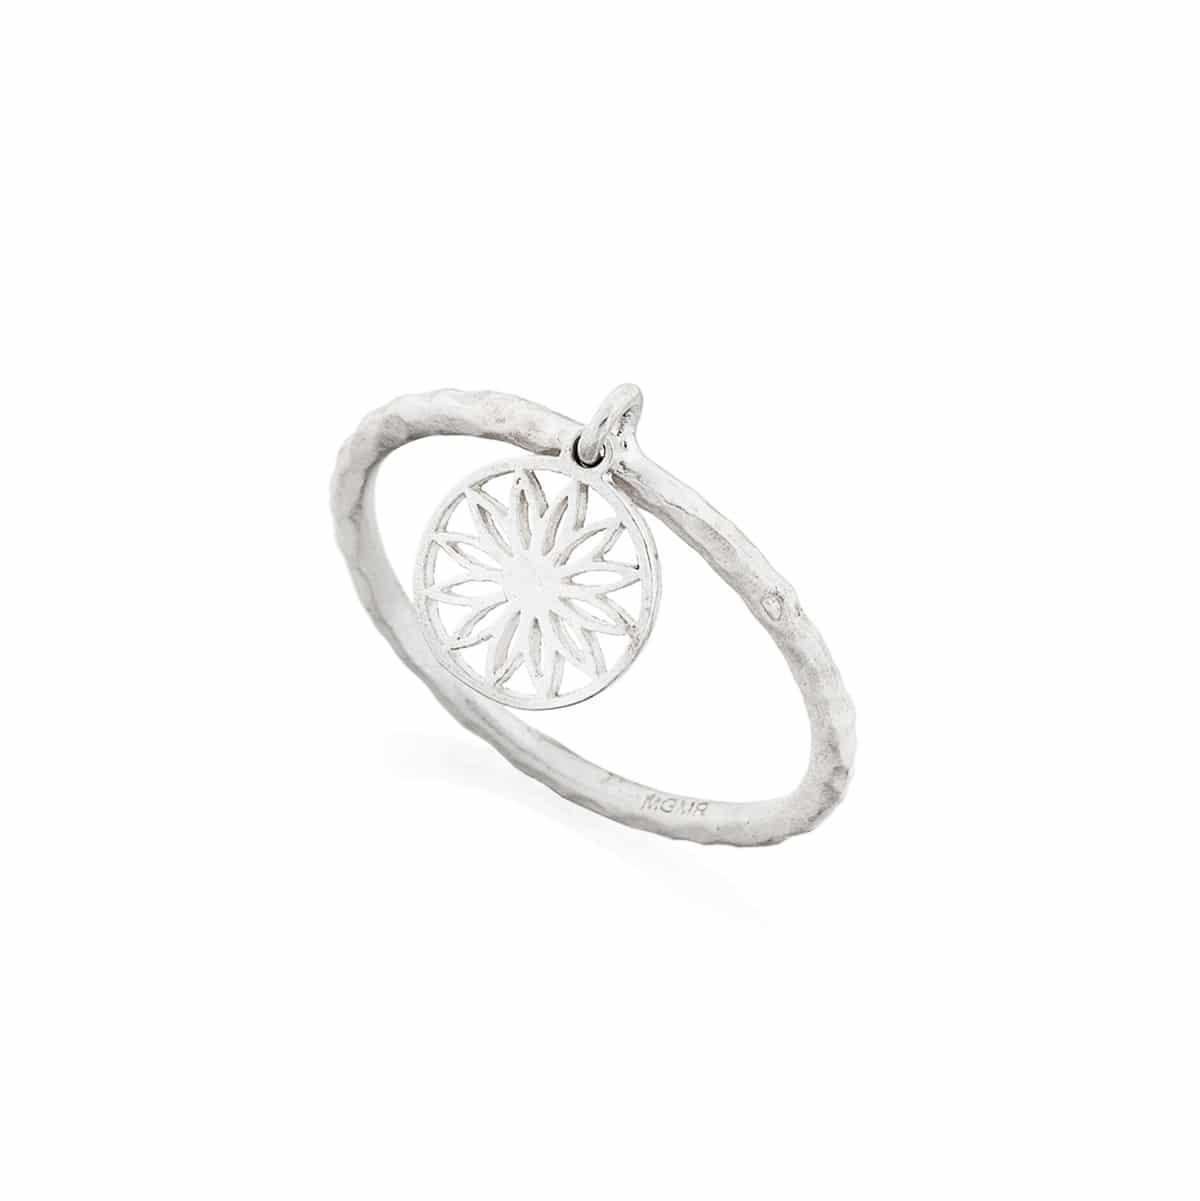 MANDALA Sterling silver Ring